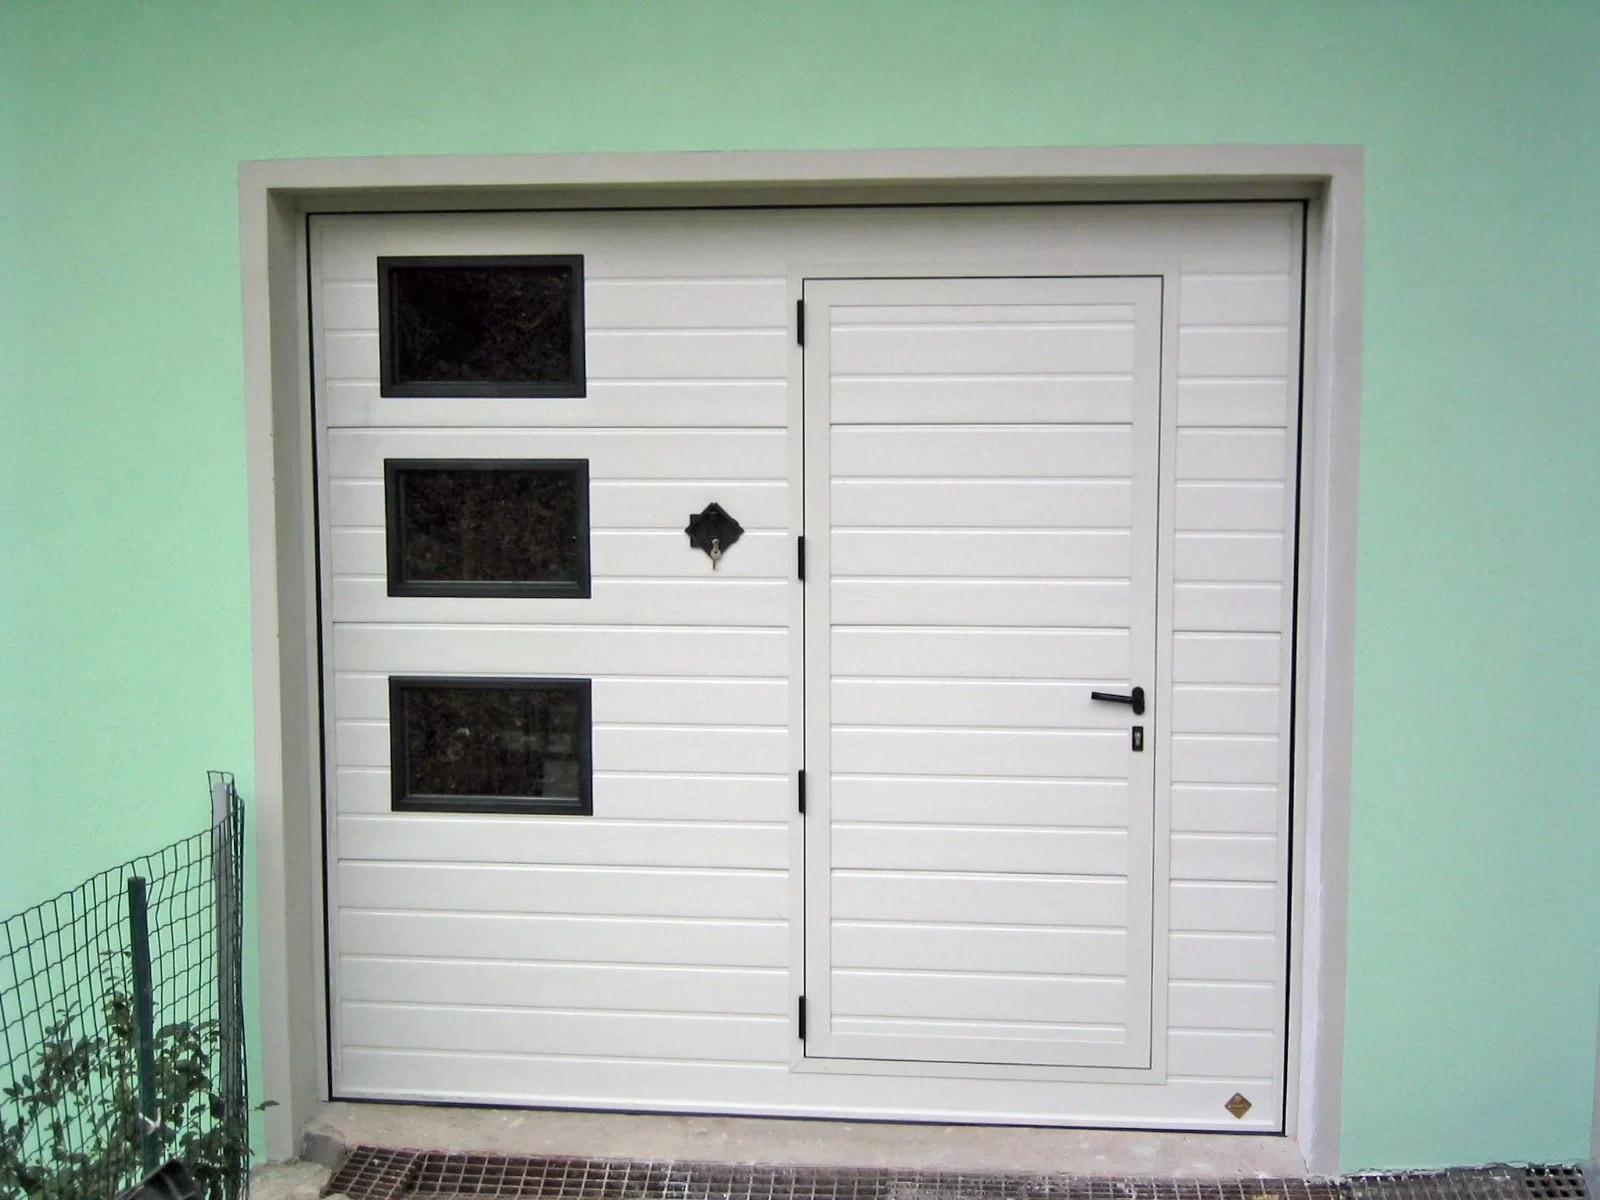 Portone basculante da garage BASCULINO - Stucco bianco C81 porta pedonale